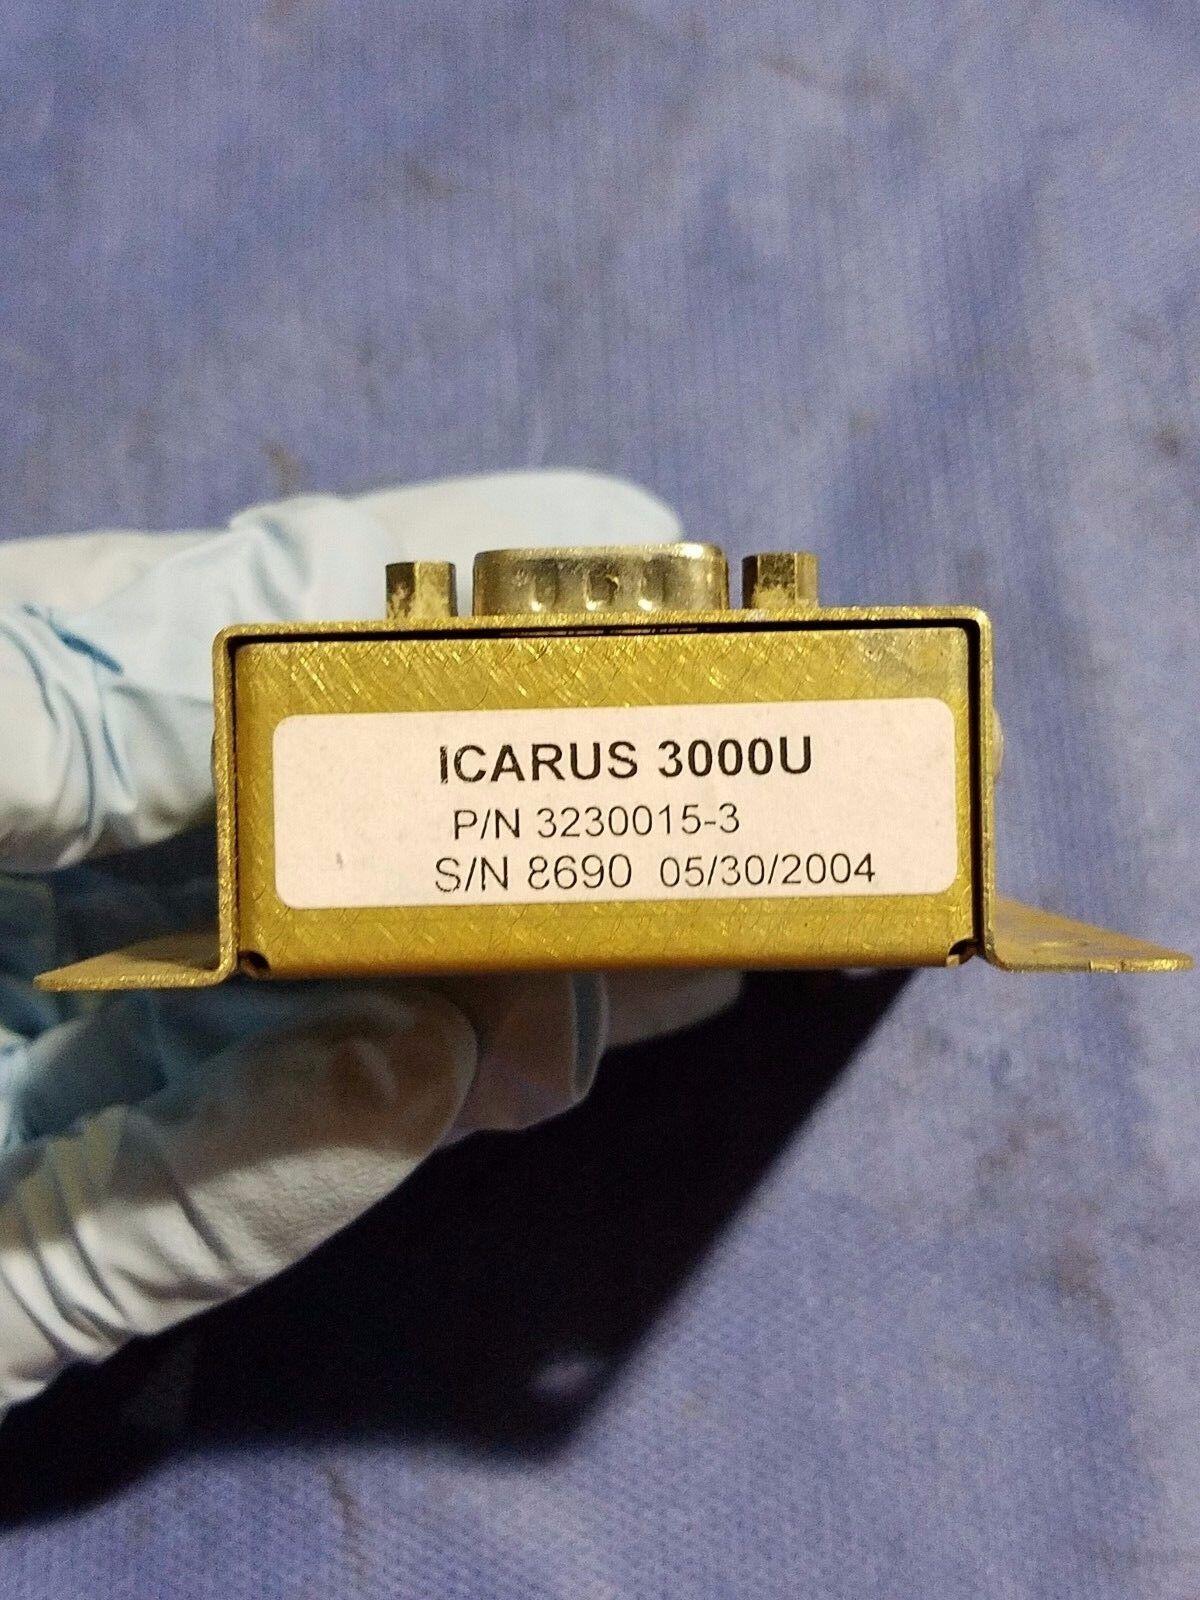 Icarus 3000U Mode C Serializer P/N 3230015-3 (0616-132)